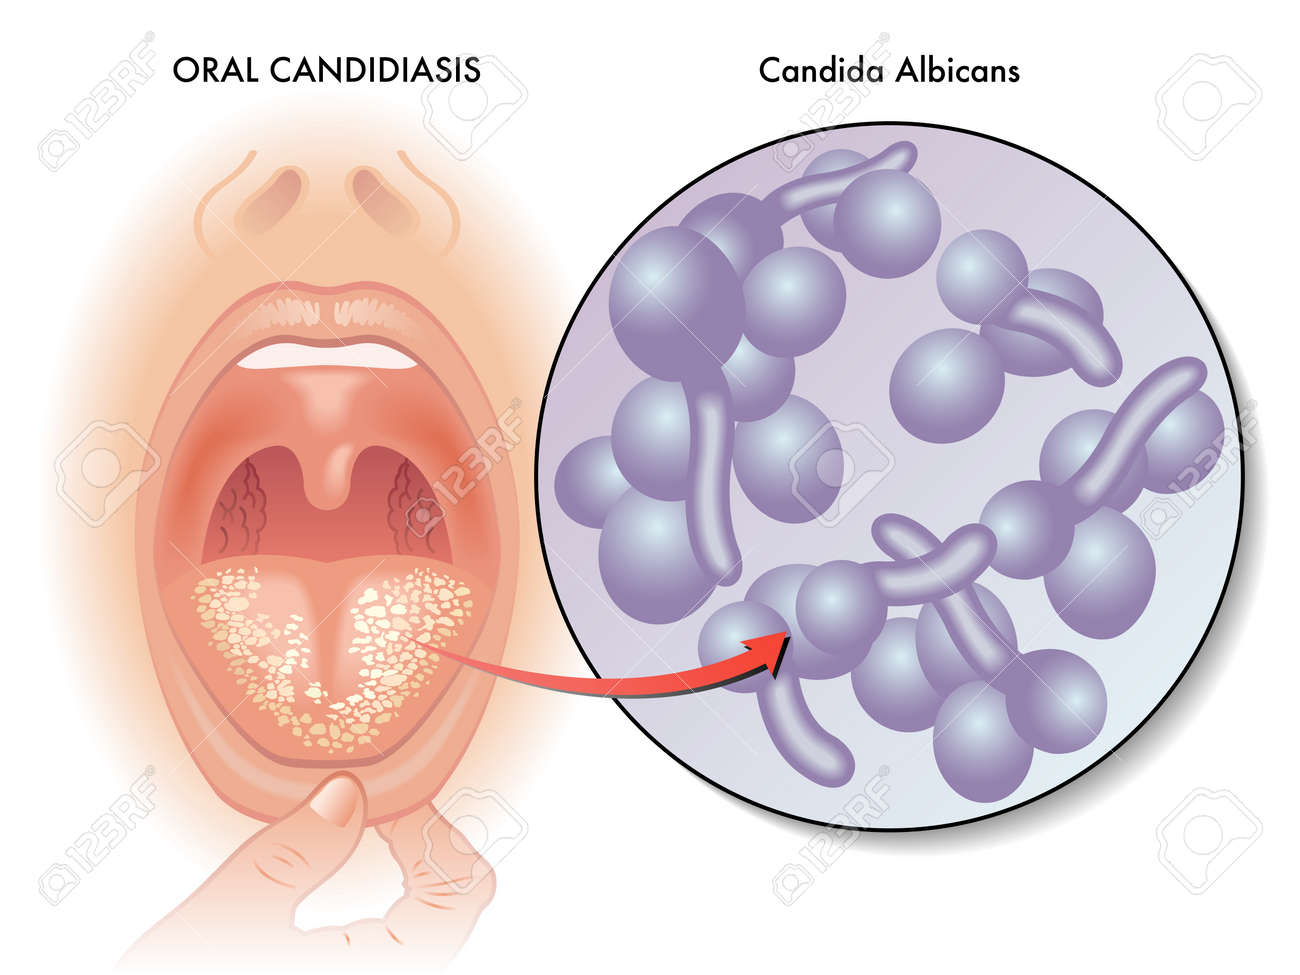 symptoms of oral candidiasis - 88223181